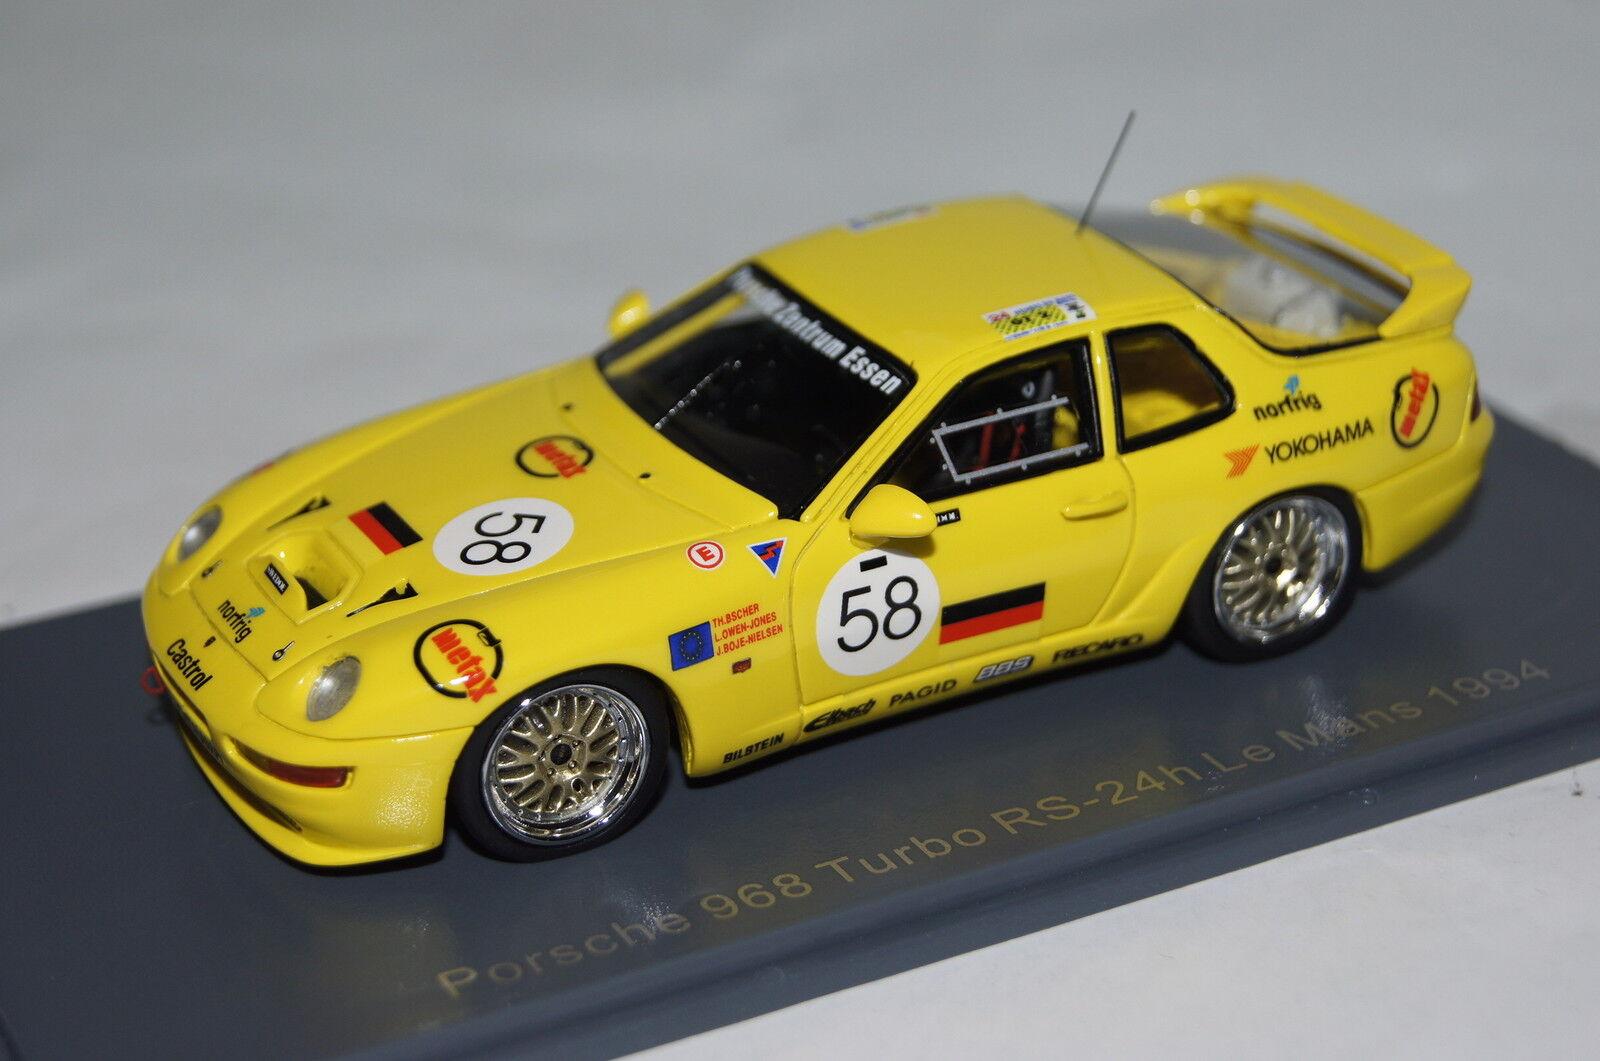 Porsche 968 Turbo RS Lemans 24h giallo 1 43 neo nuevo & OVP 43837